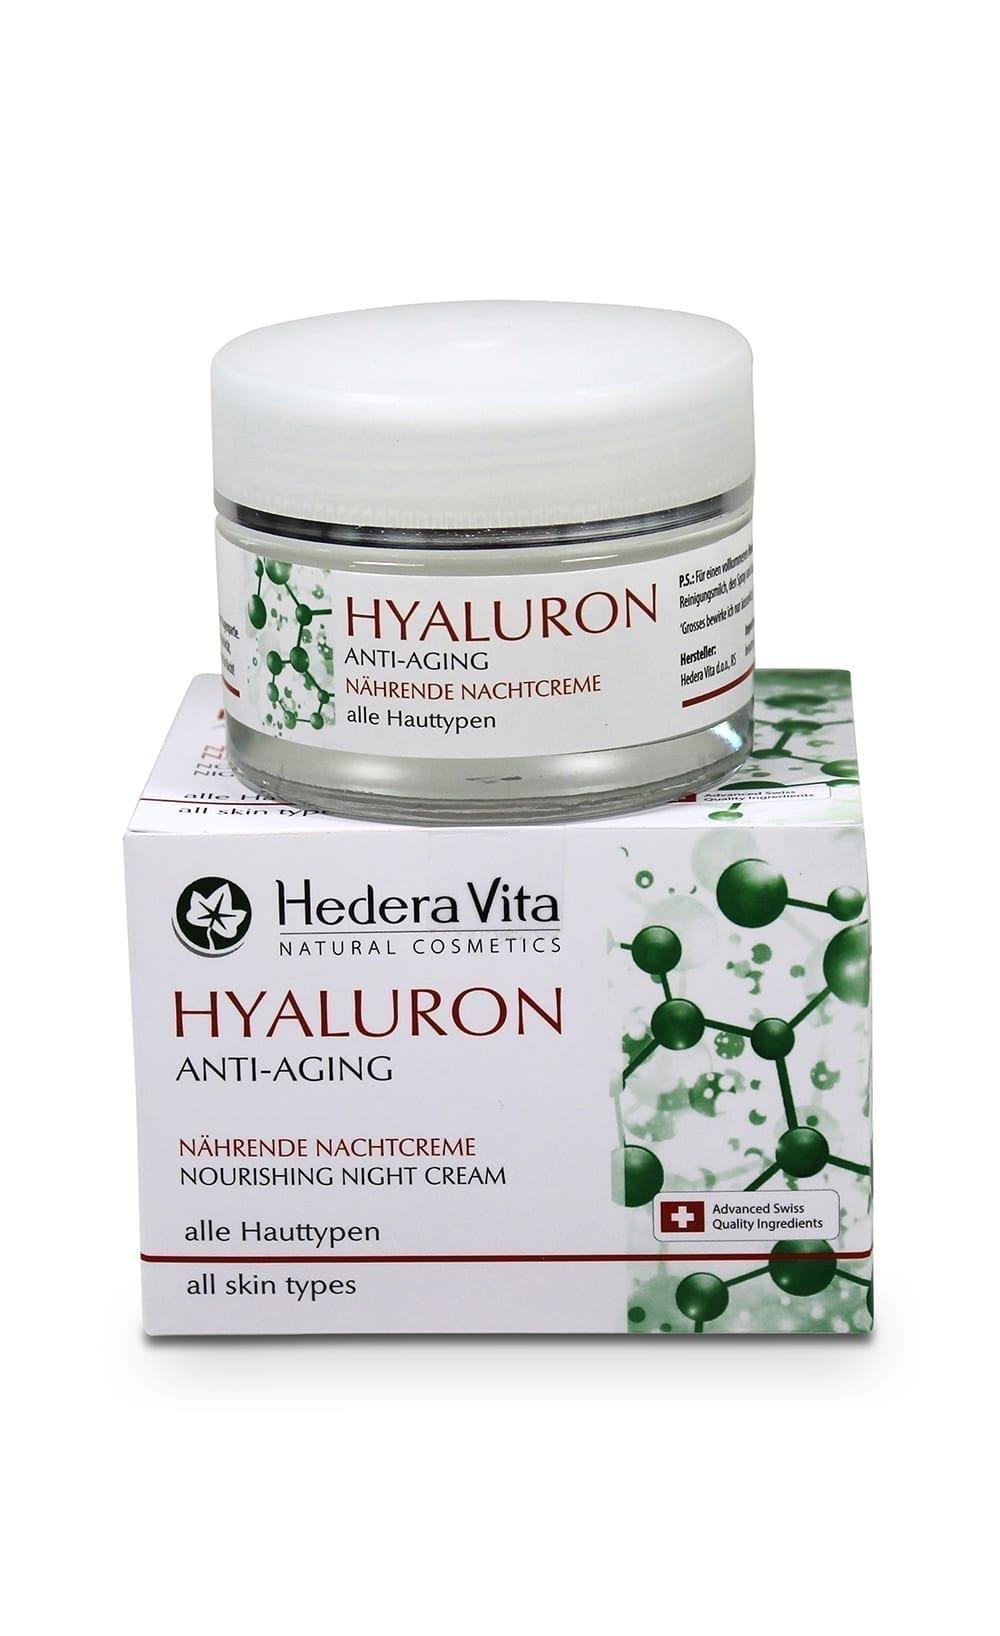 Hyaluron Anti-Aging Nachtcreme 50ml